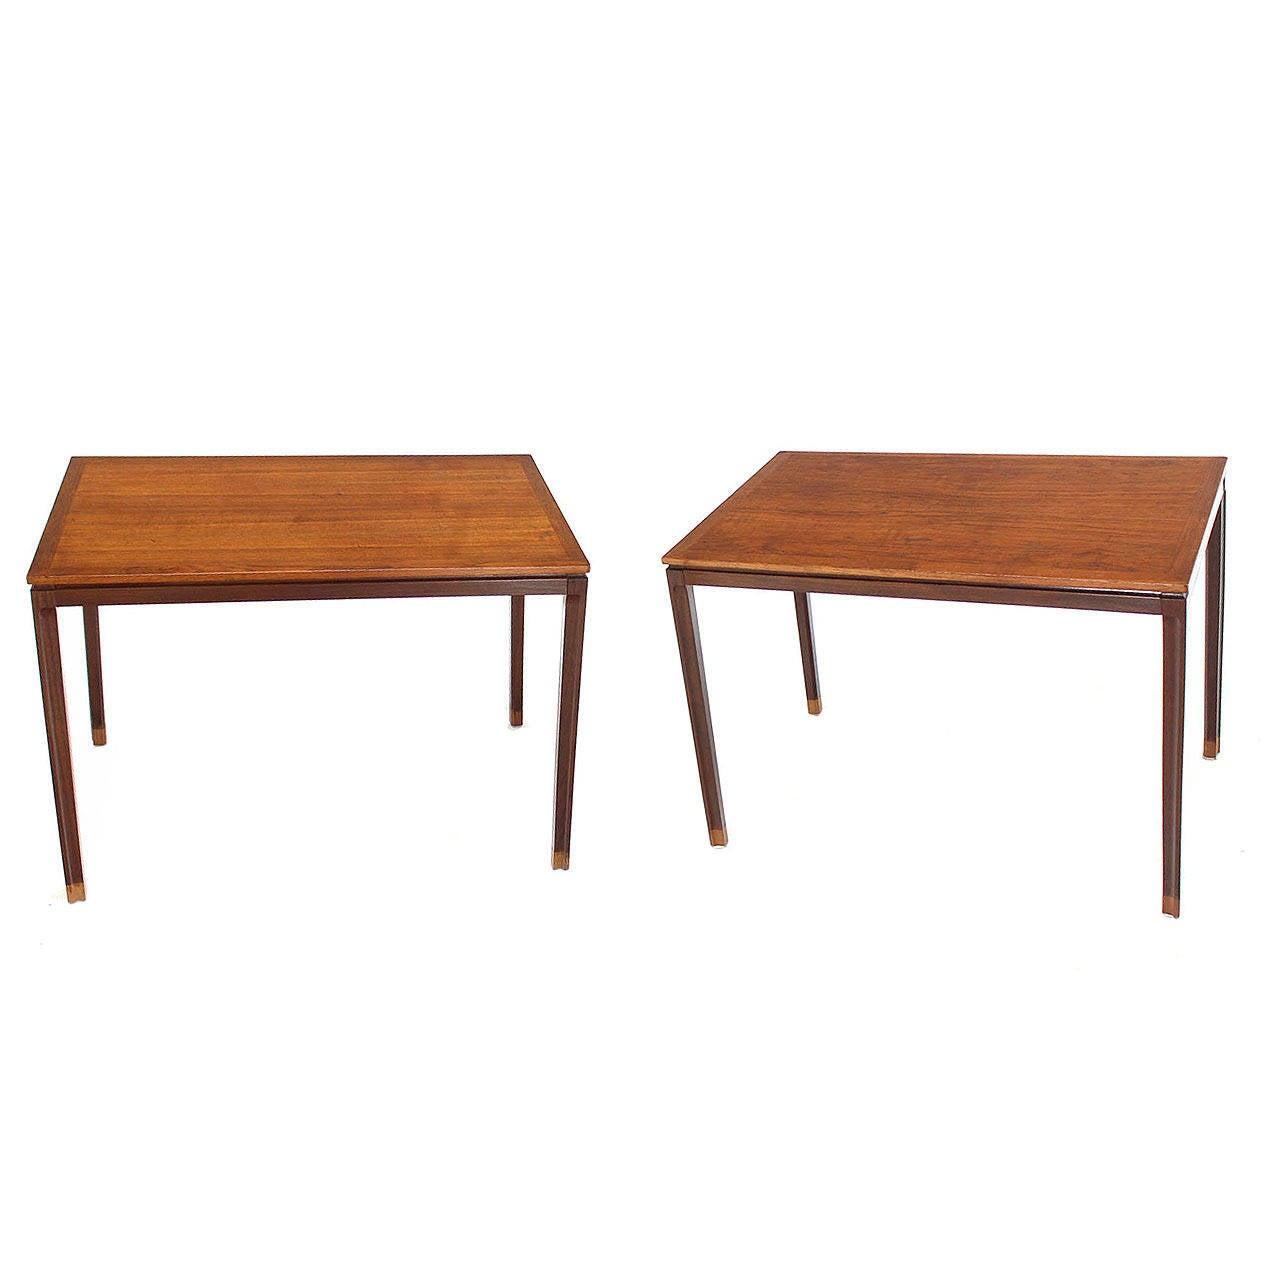 Pair of Danish Modern Teak Rectangular End Tables